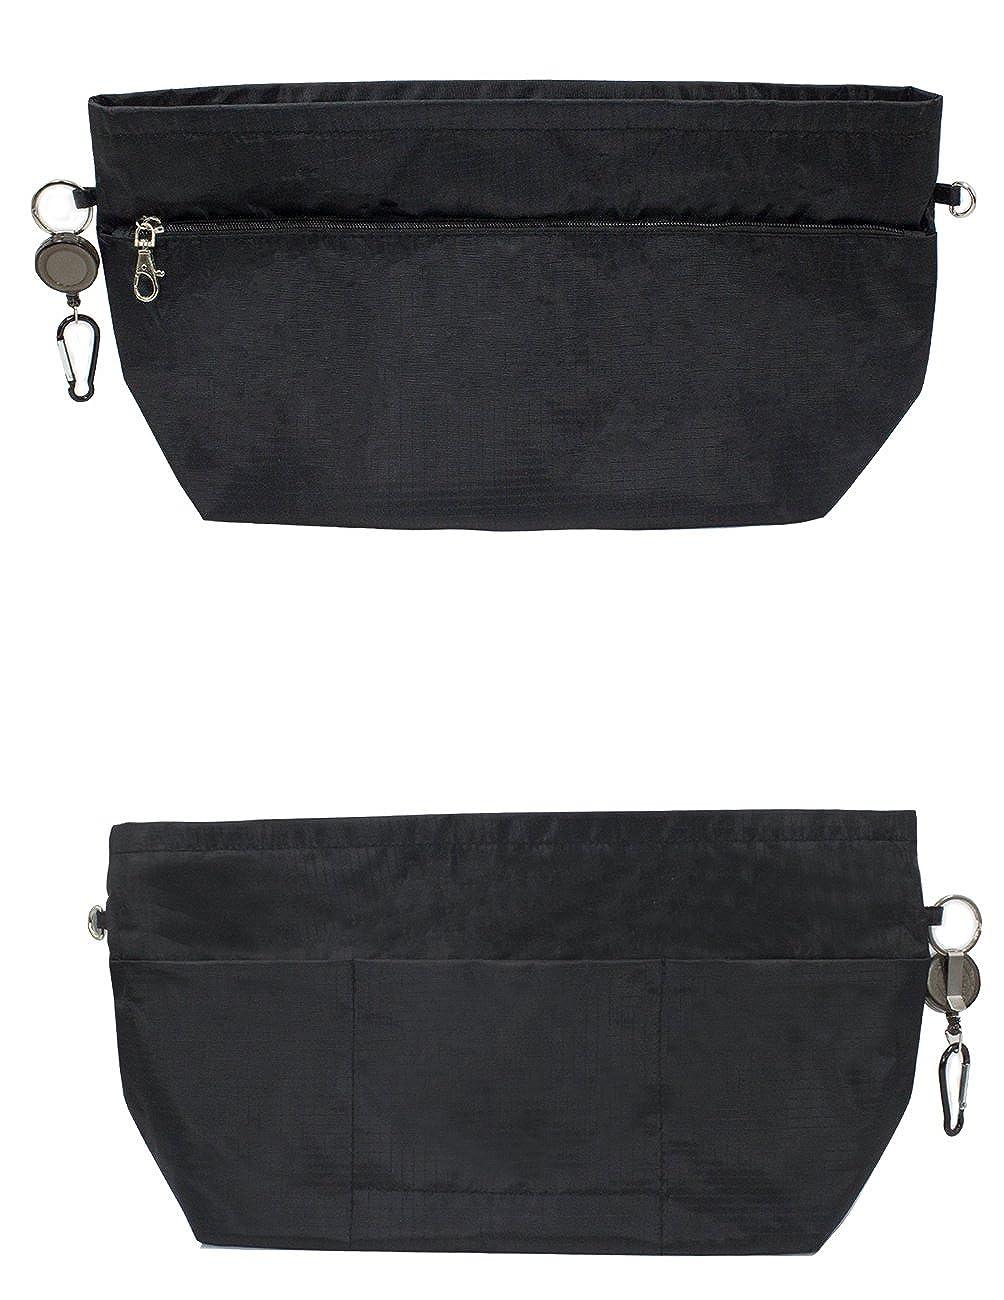 b730ef5e3857 Dahlia Women s Purse Organizer - Convenient Insert for Tote - Black at  Amazon Women s Clothing store